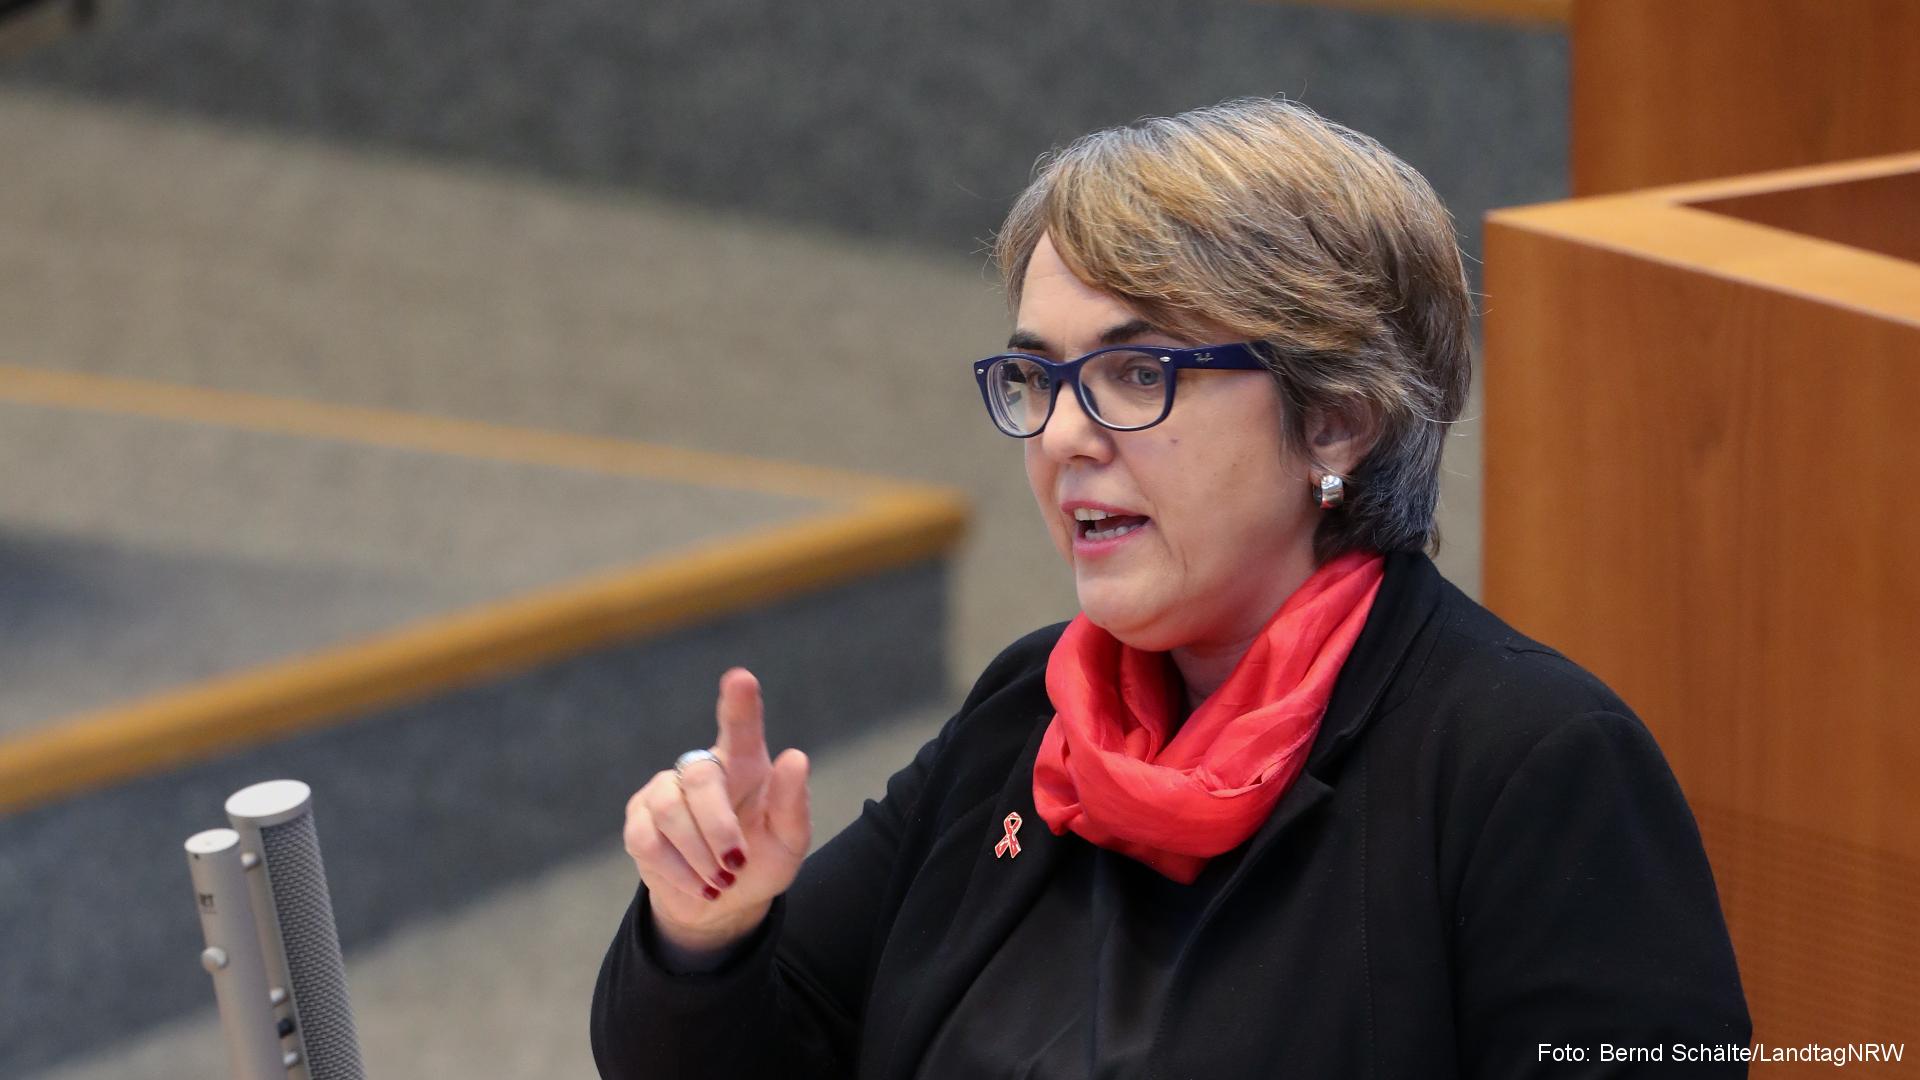 Anja Butschkau